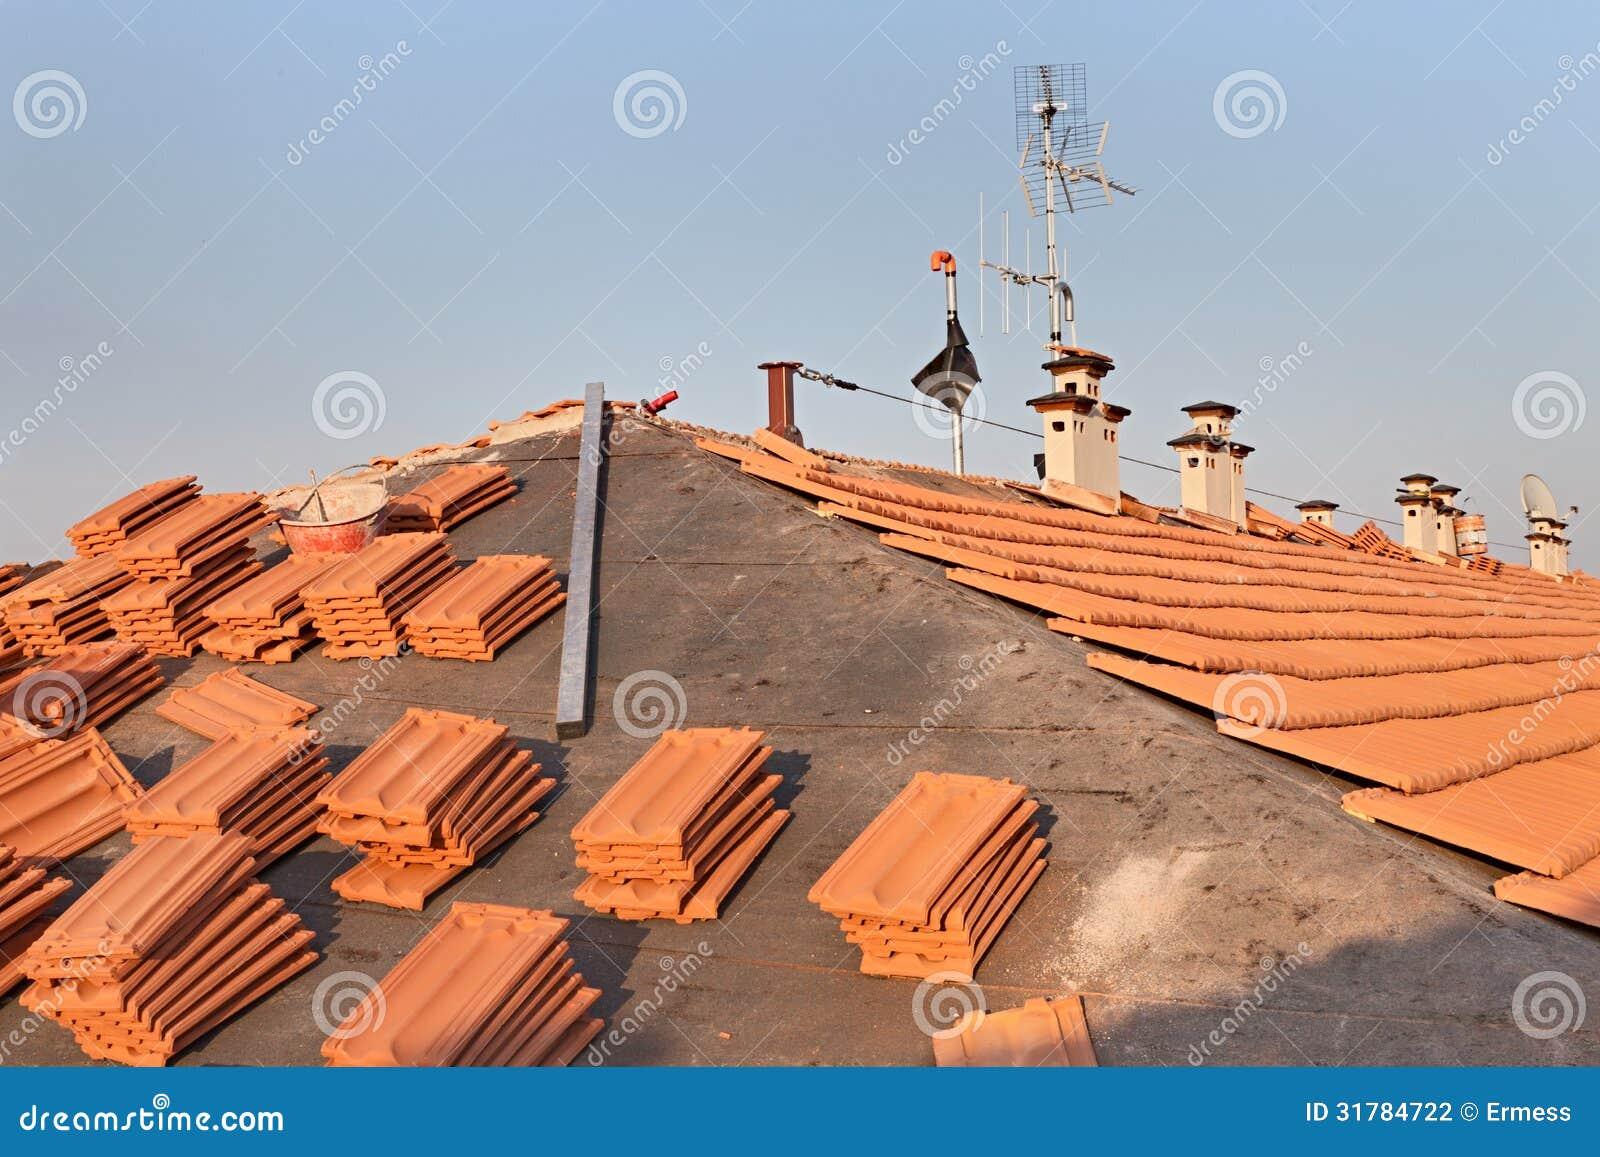 Install Chimney Antenna